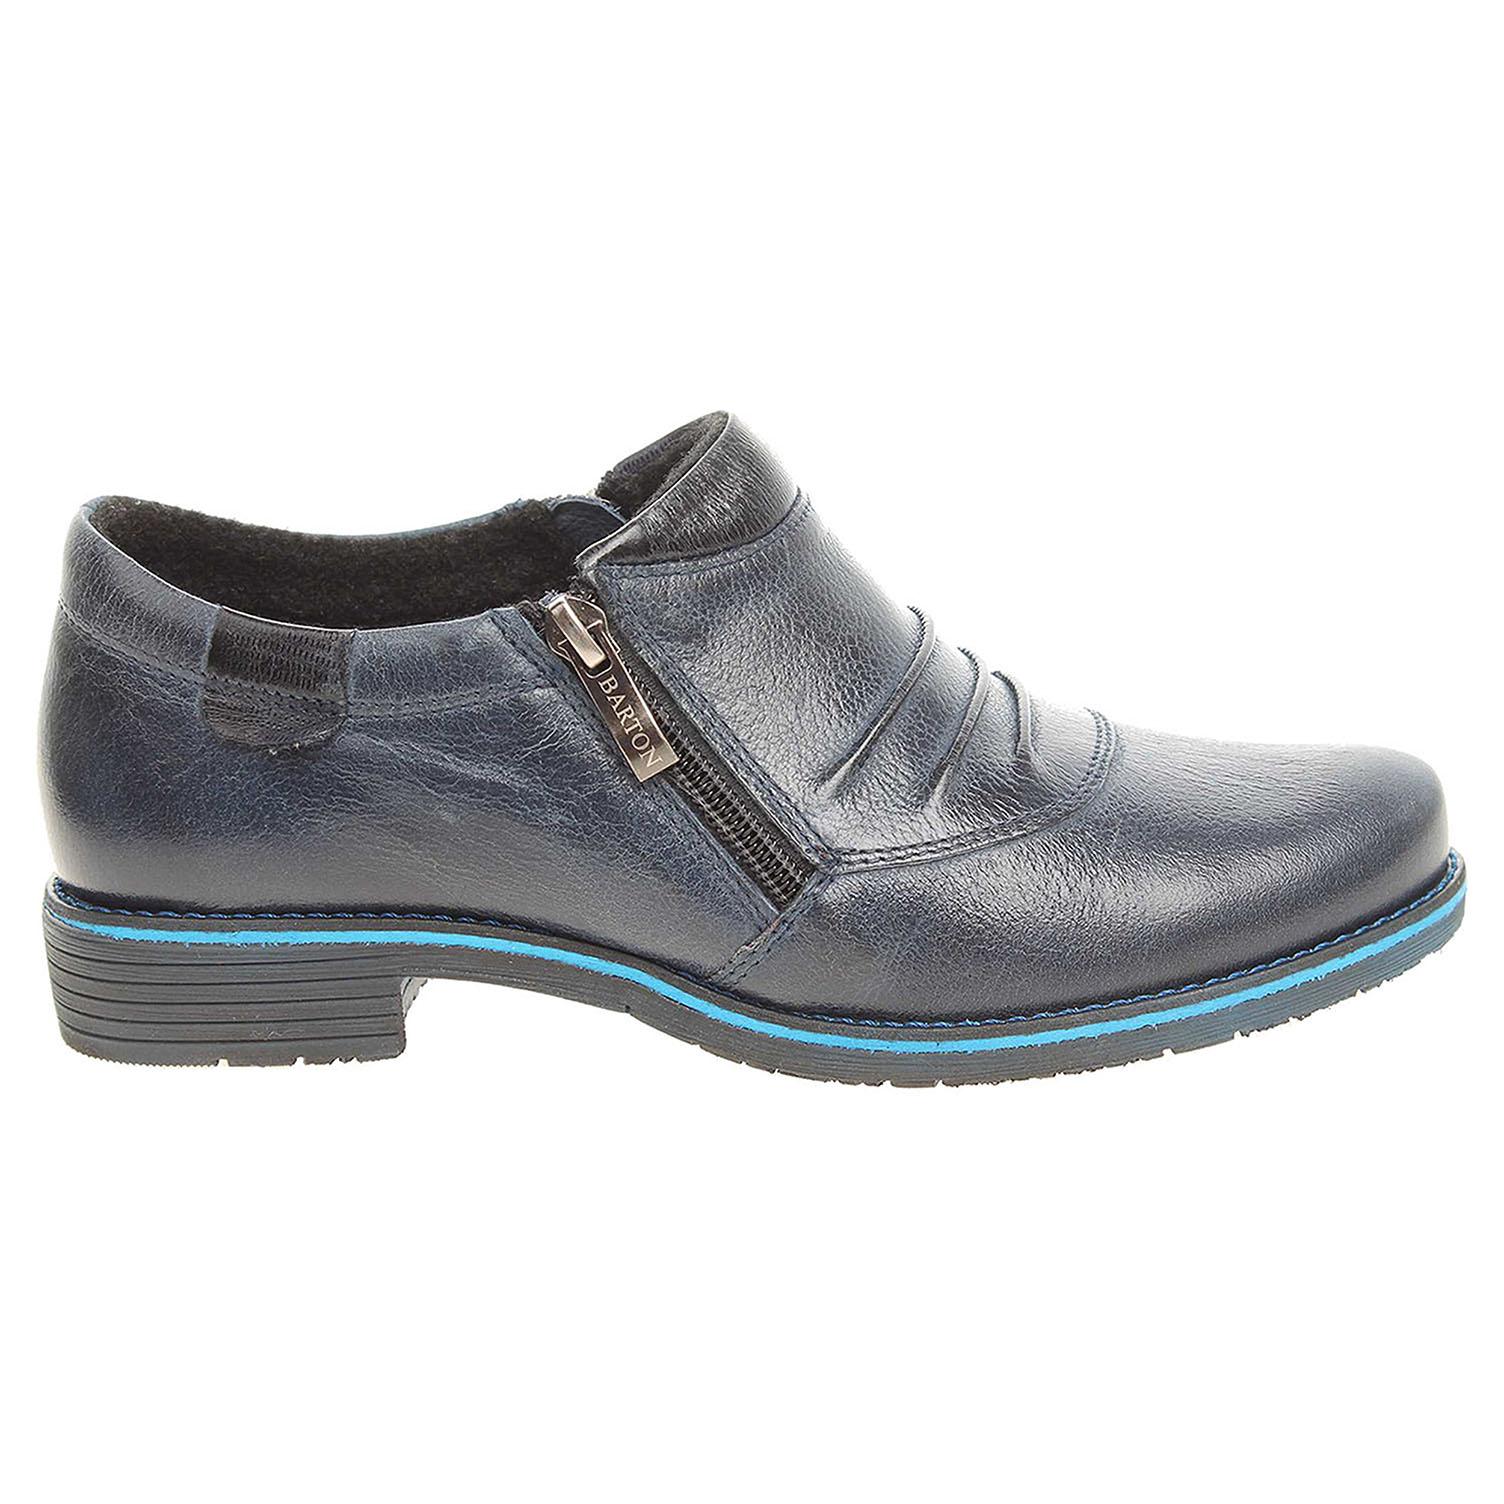 f4d0573d269 Ecco Barton dámská obuv 11716 modrá 23200562